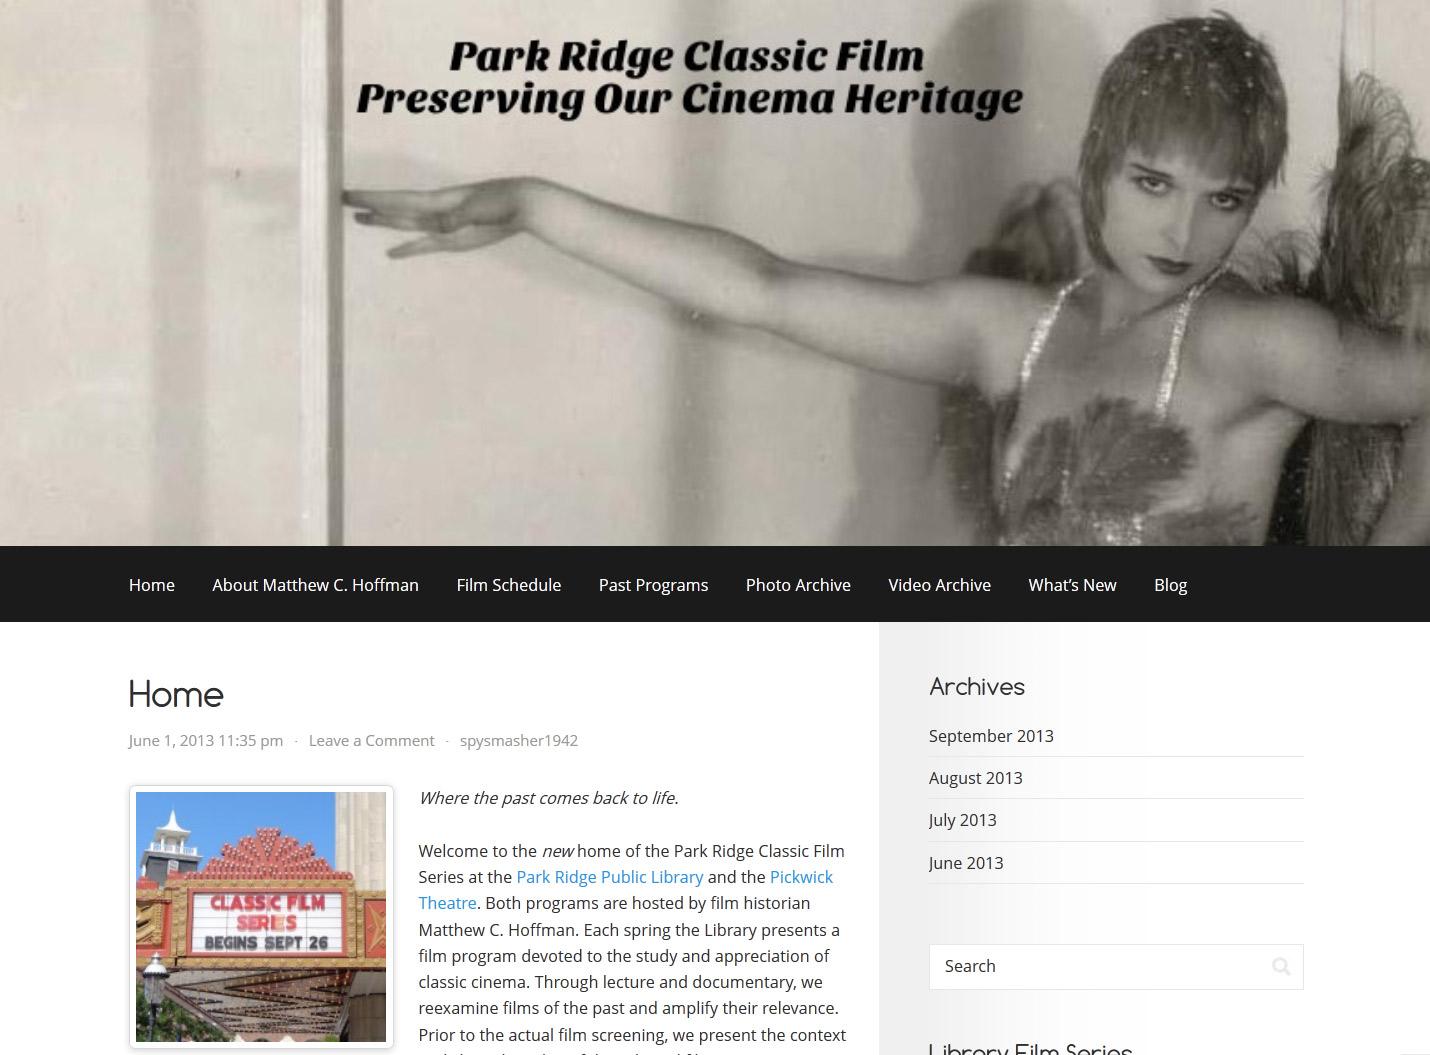 PickwickClassicFilmSeries